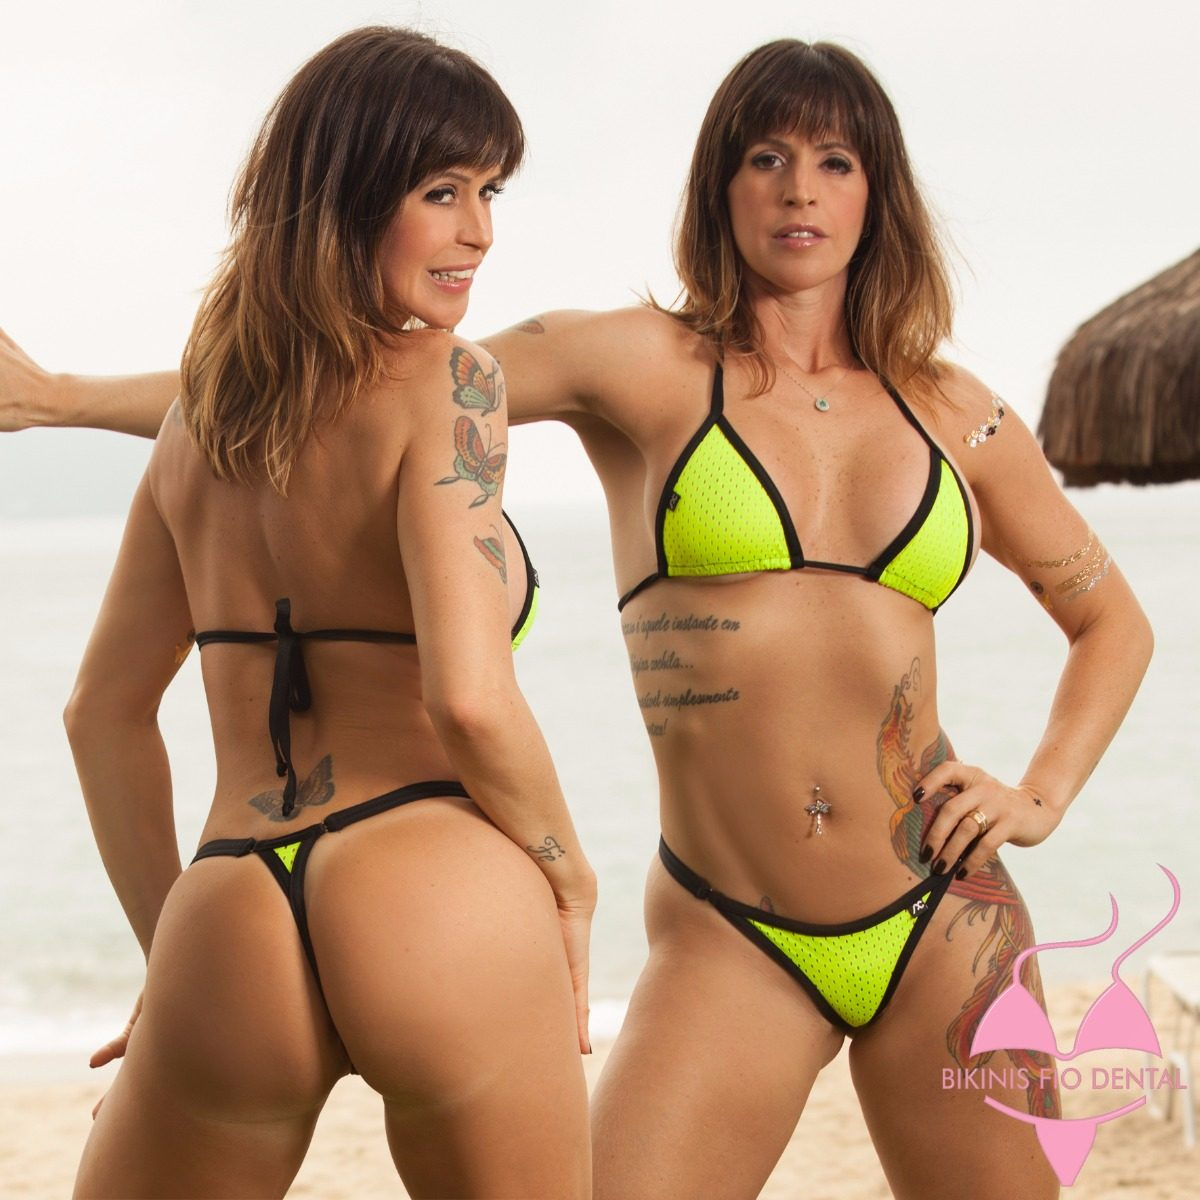 Mulheres Eiras Em Micro Bikini Silves-89355